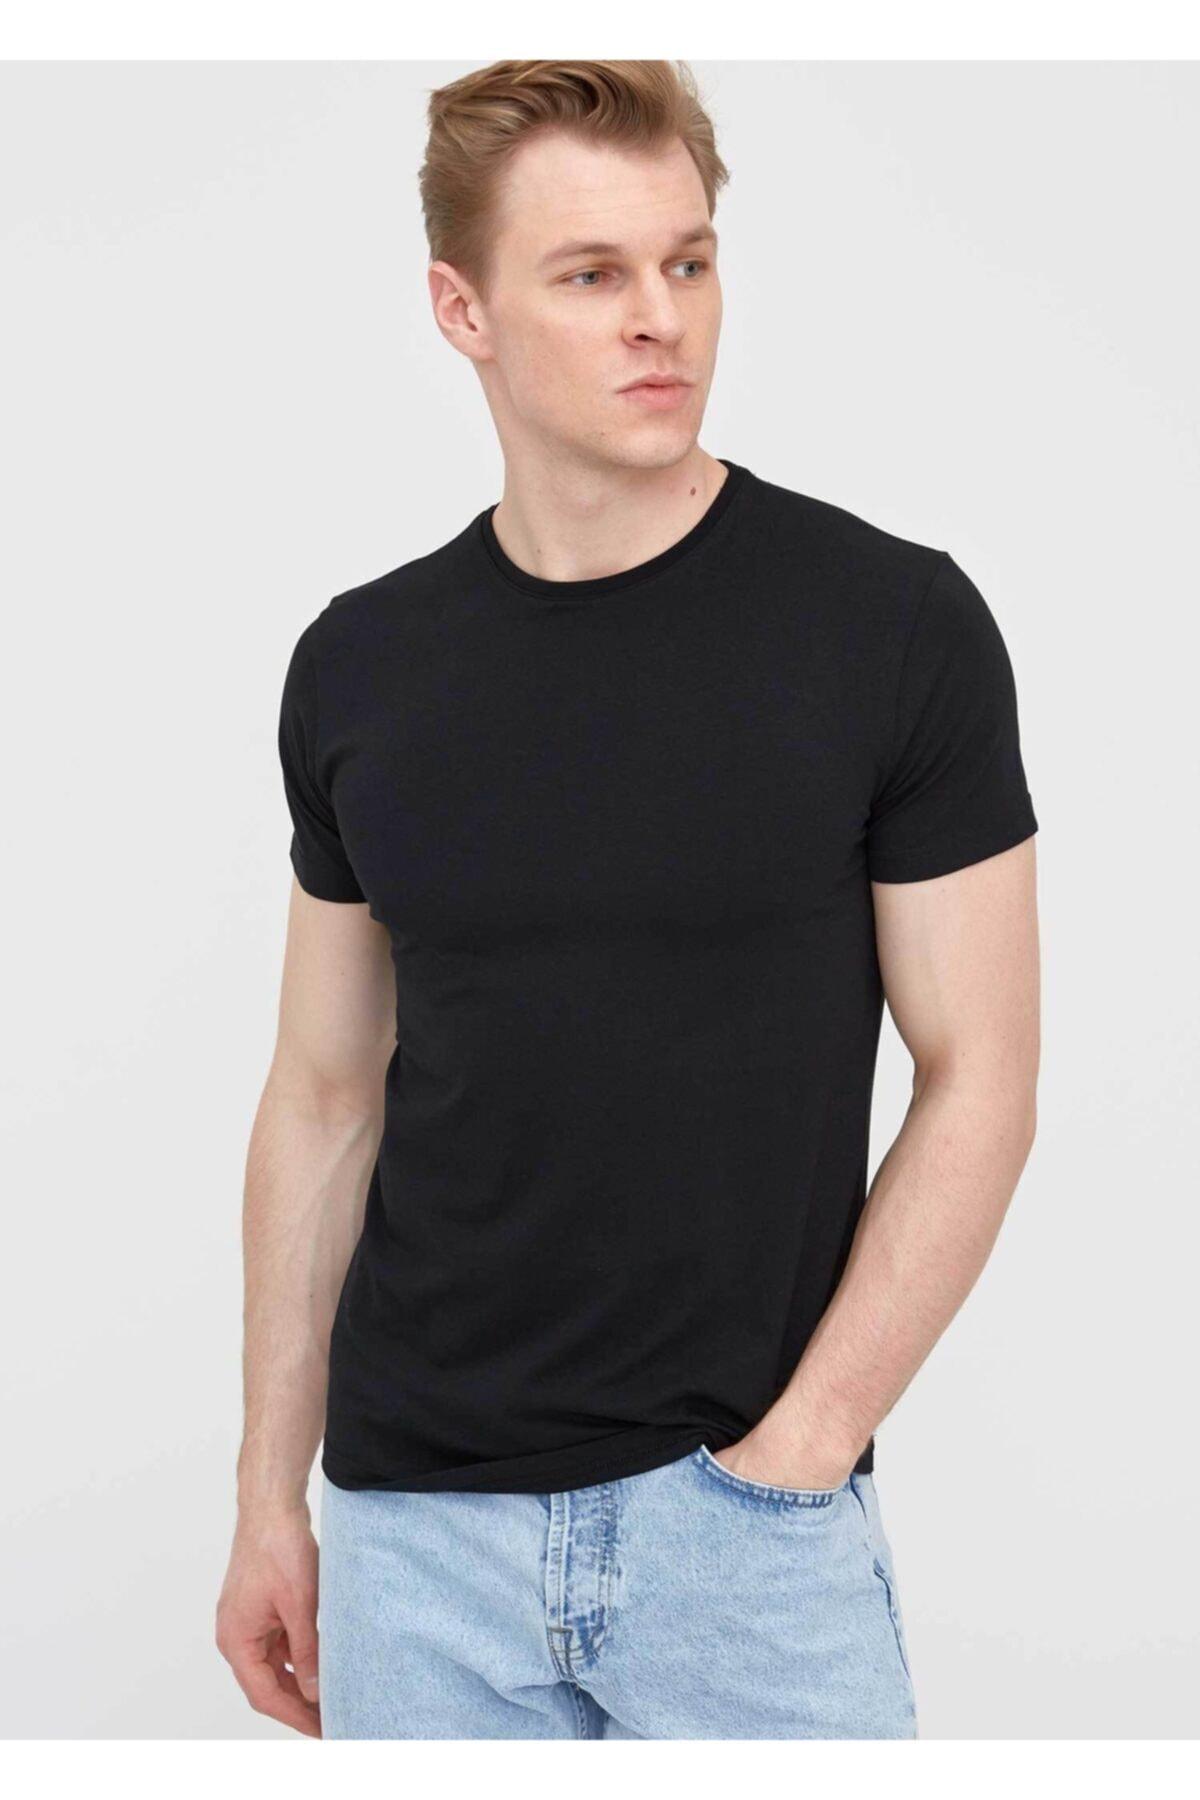 Erkek Basic Pamuklu Kısa Kollu Bisiklet Yaka T-Shirt